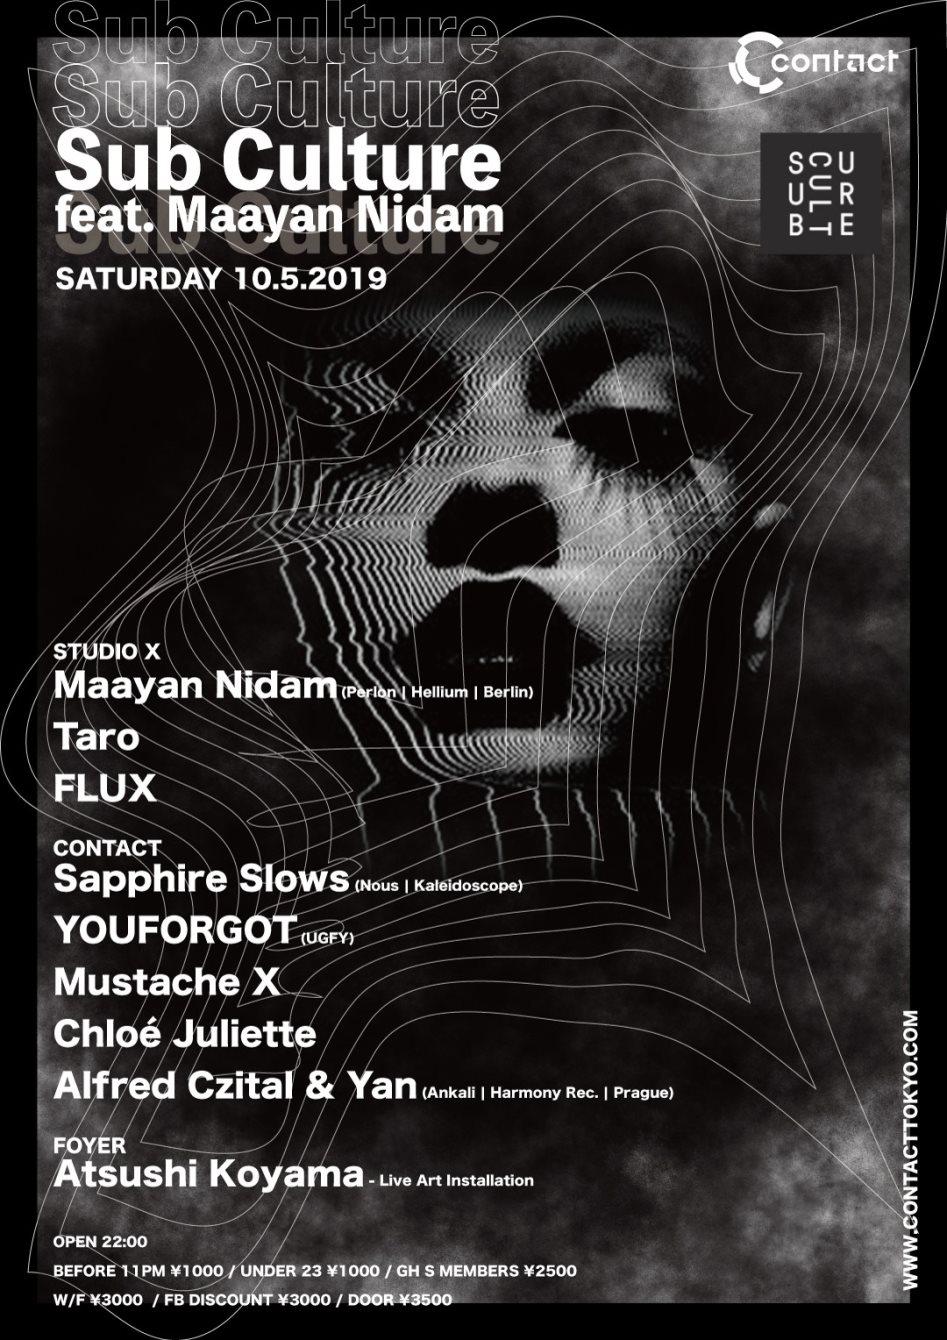 Sub Culture Feat. Maayan Nidam - Flyer front